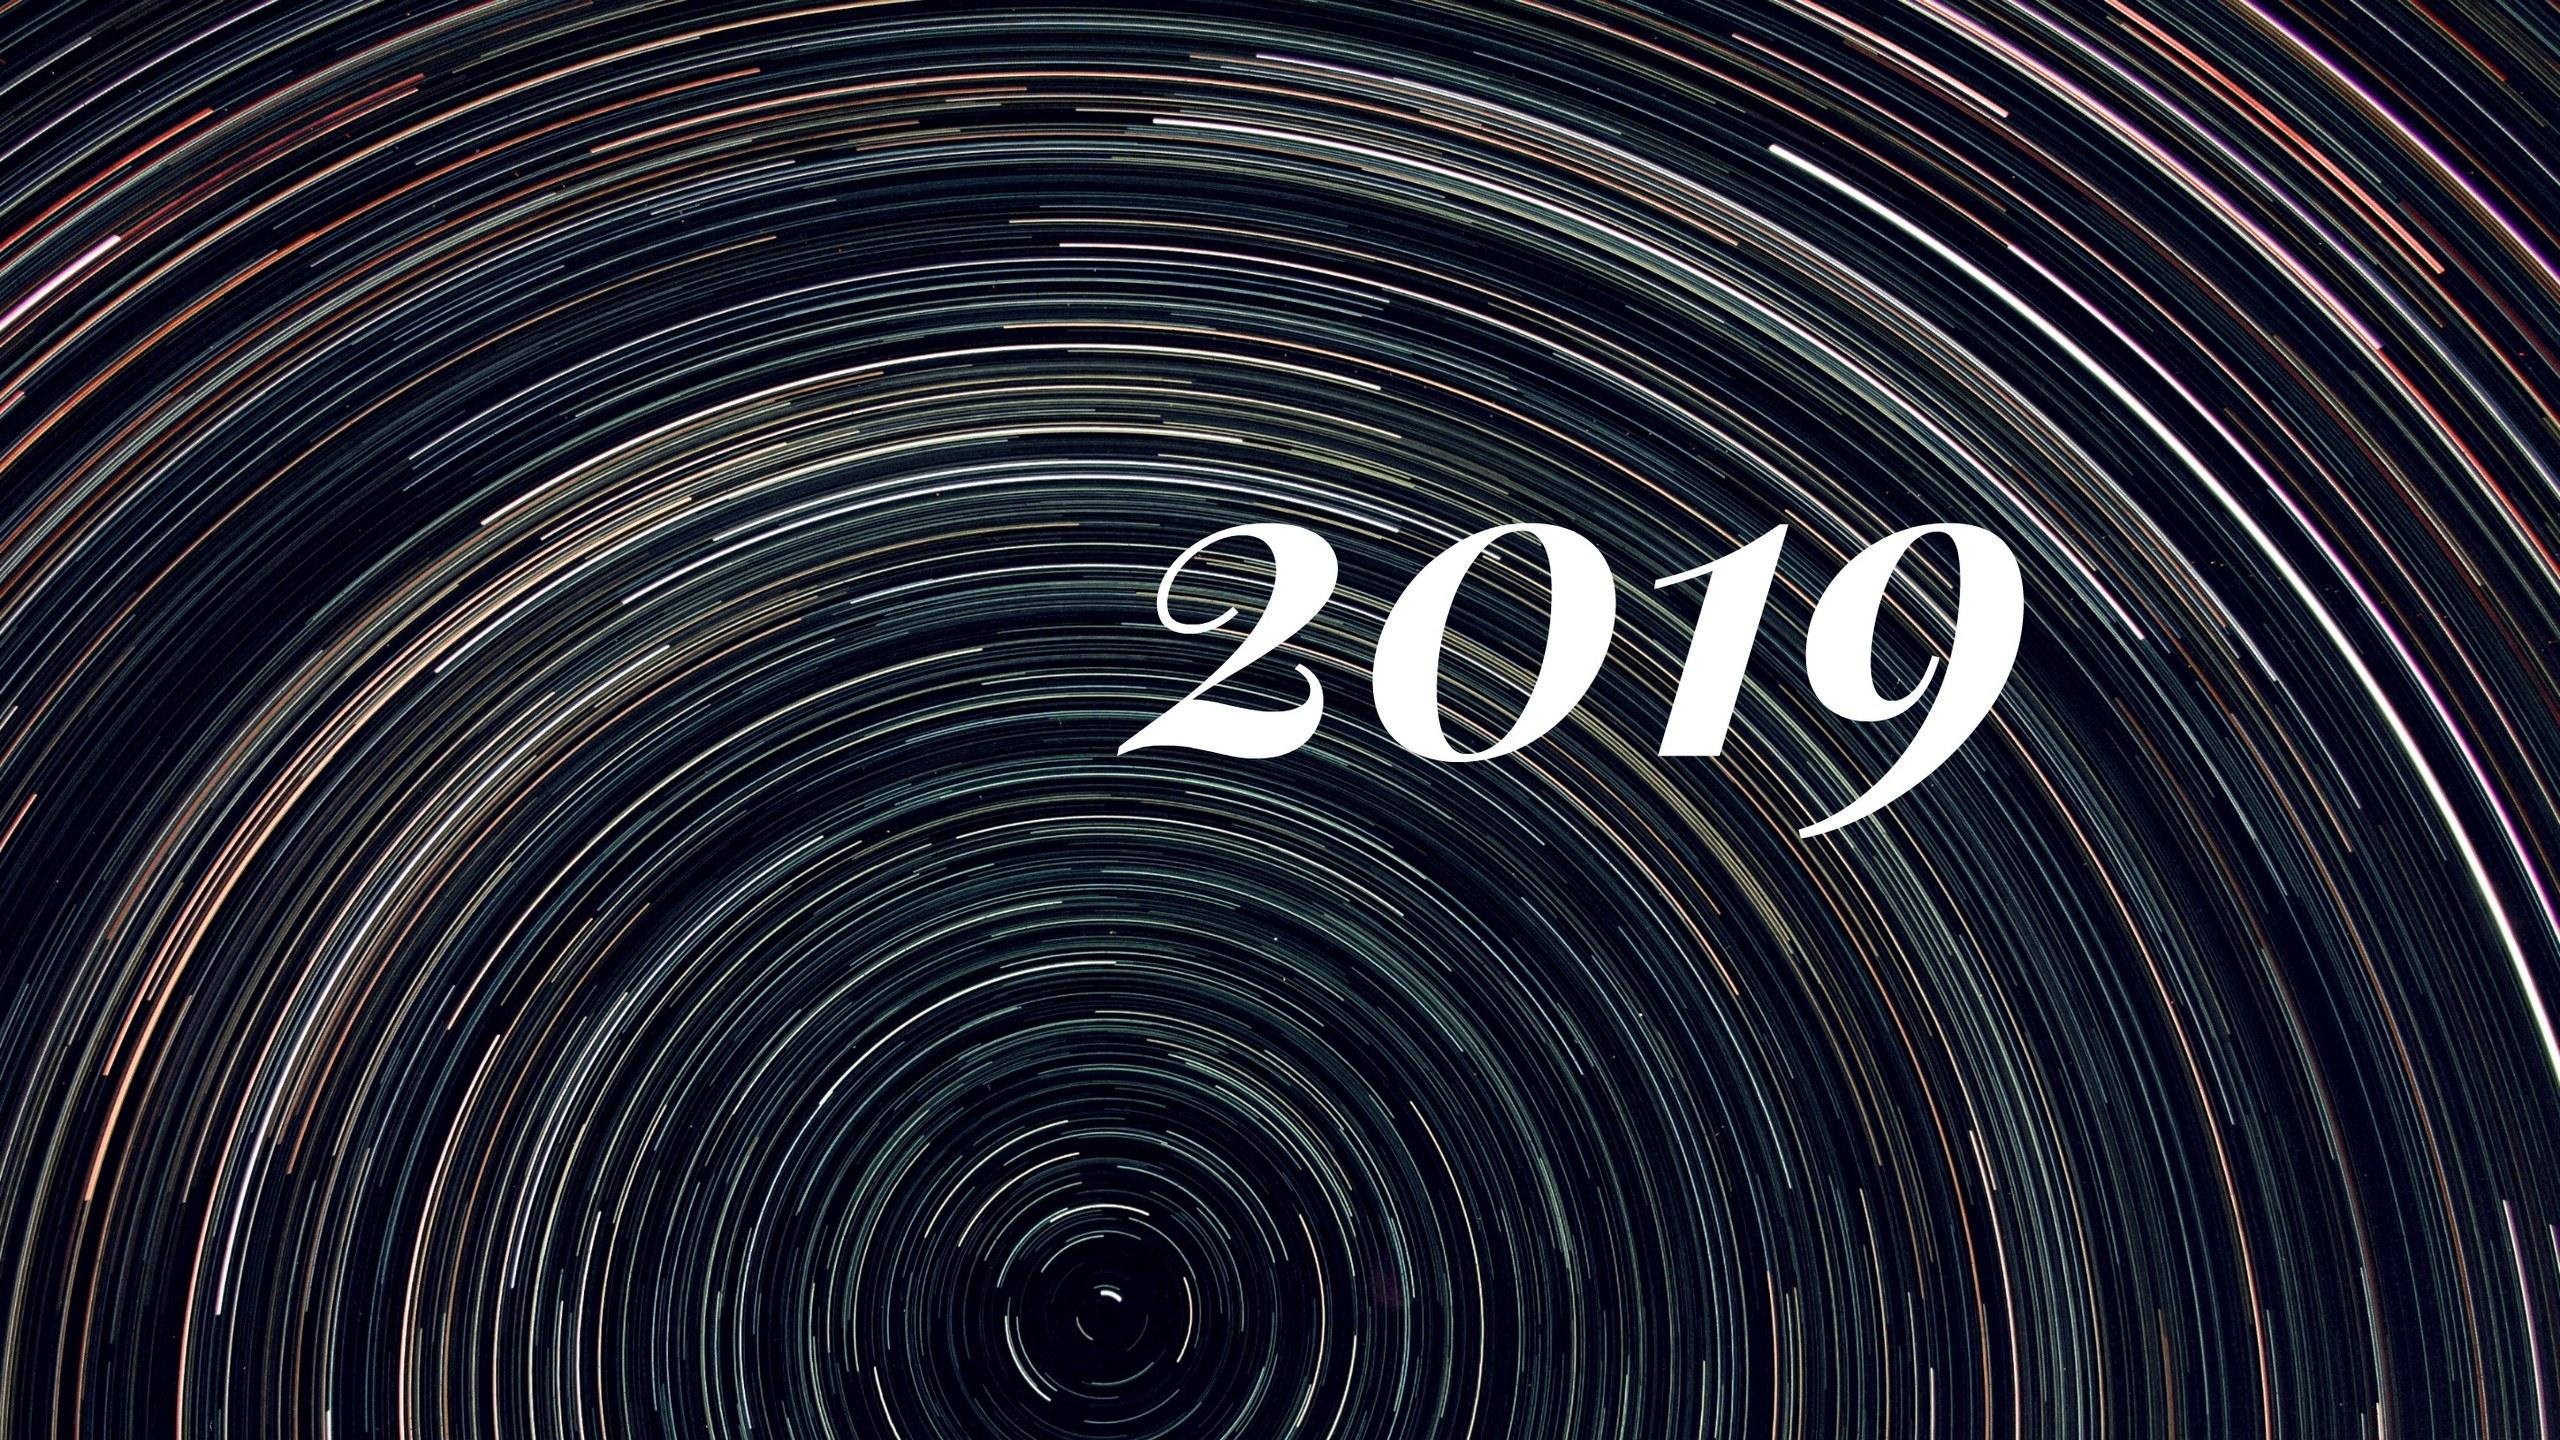 Astrology & Lunar Calendar 2019: Astronomical Event Dates To inside What Is The Lunar Calendar Date Today